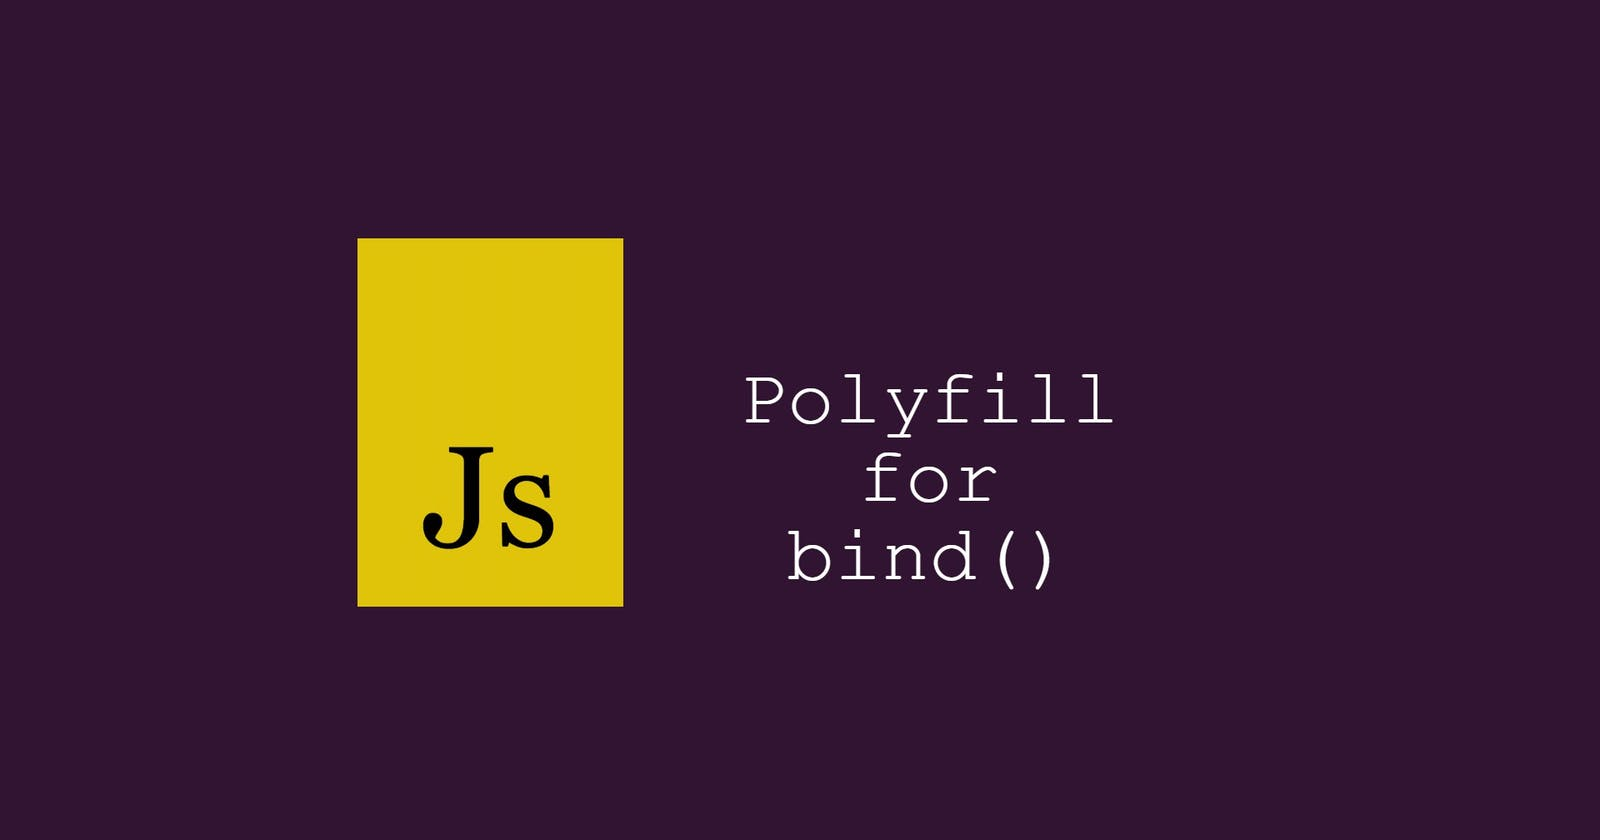 Polyfill for bind() method